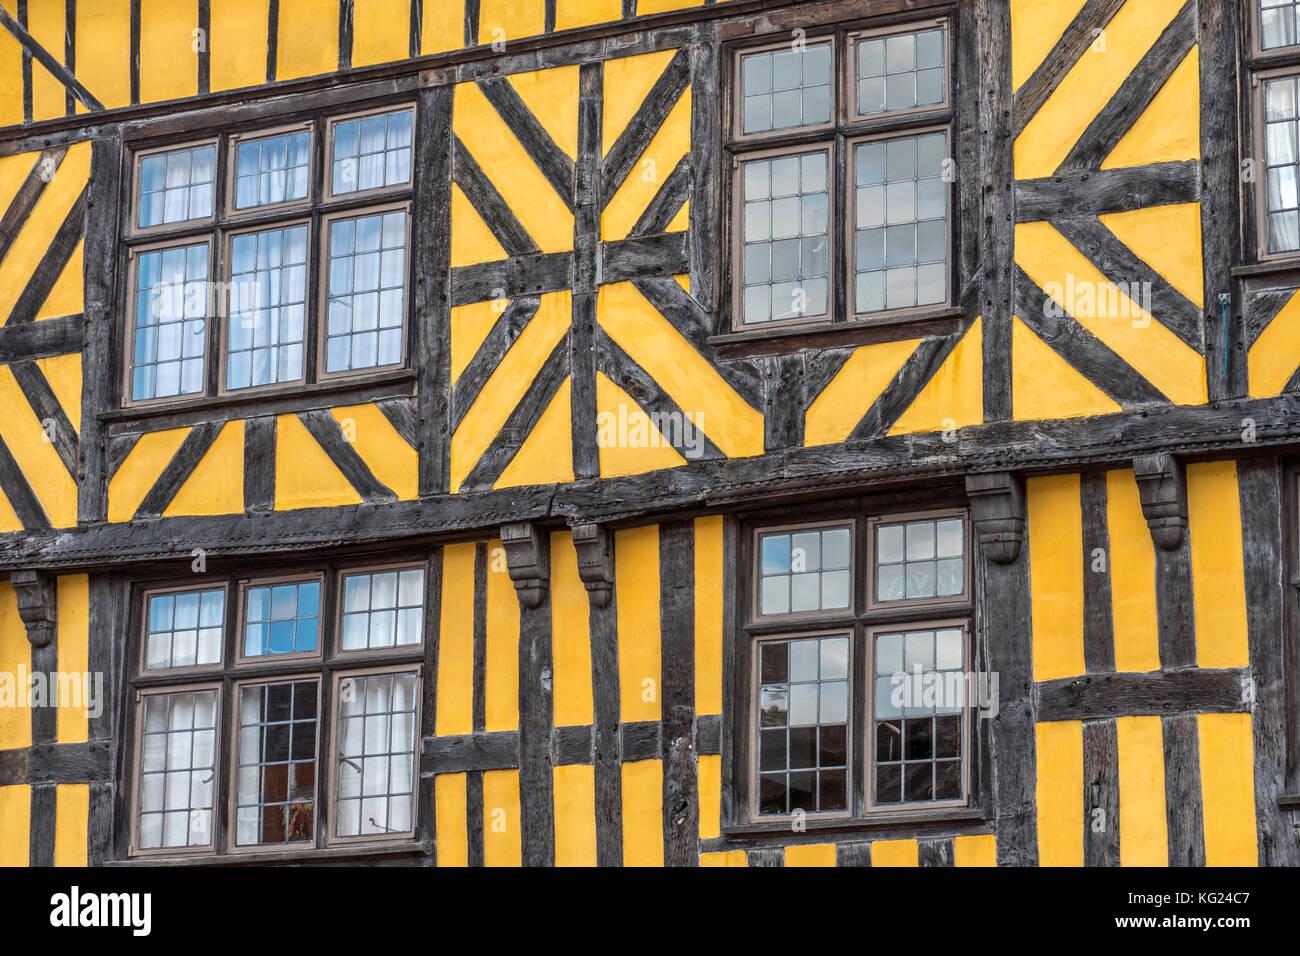 Ludlow Shropshire England Stock Photo